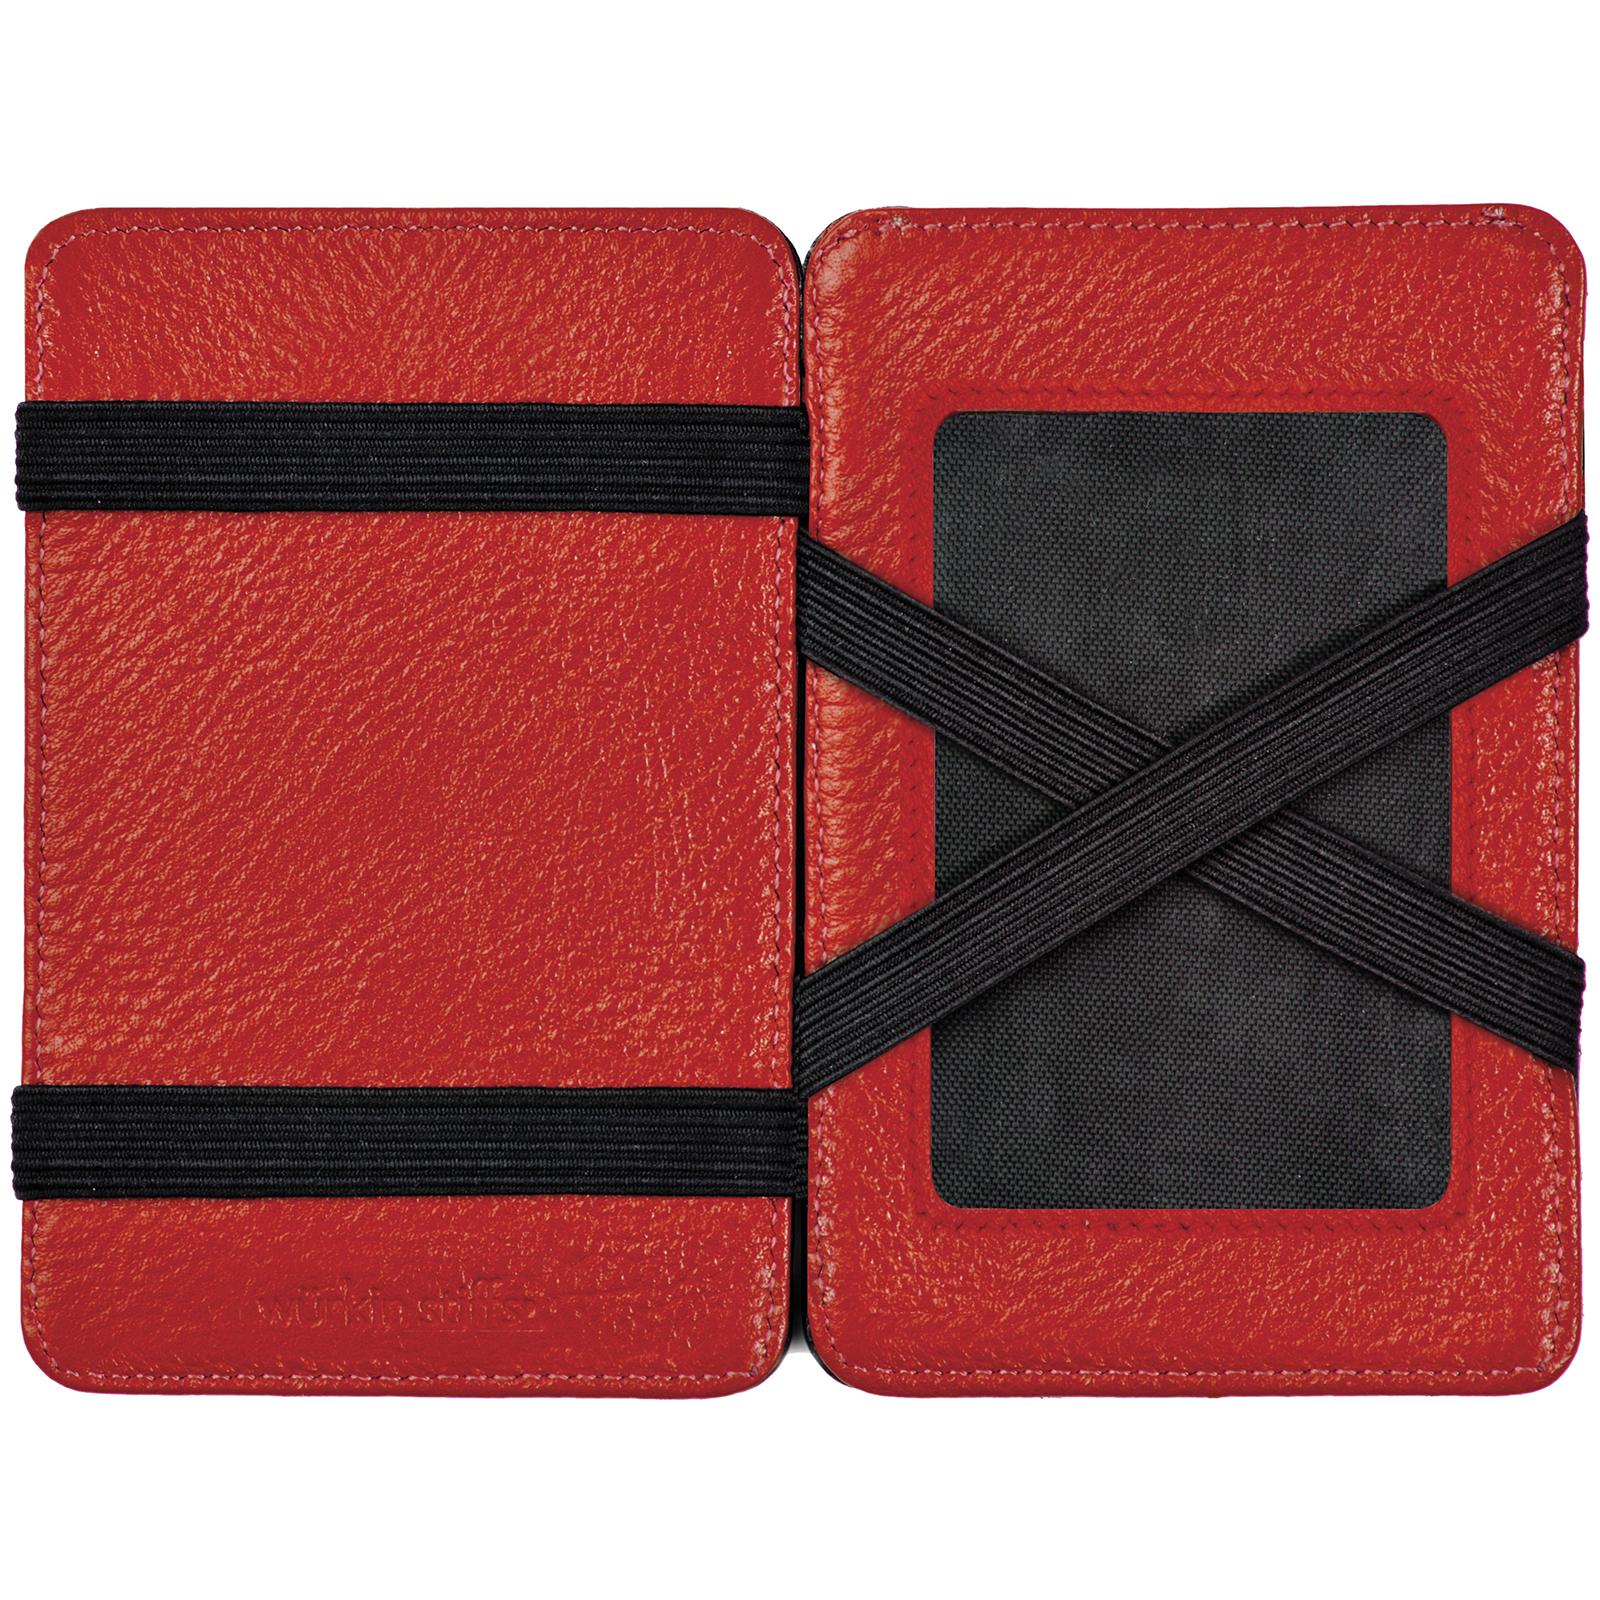 Wurkin Stiffs Mens Black W Red Interior Leather 5 Pocket Magic Rfid Wallet New Ebay